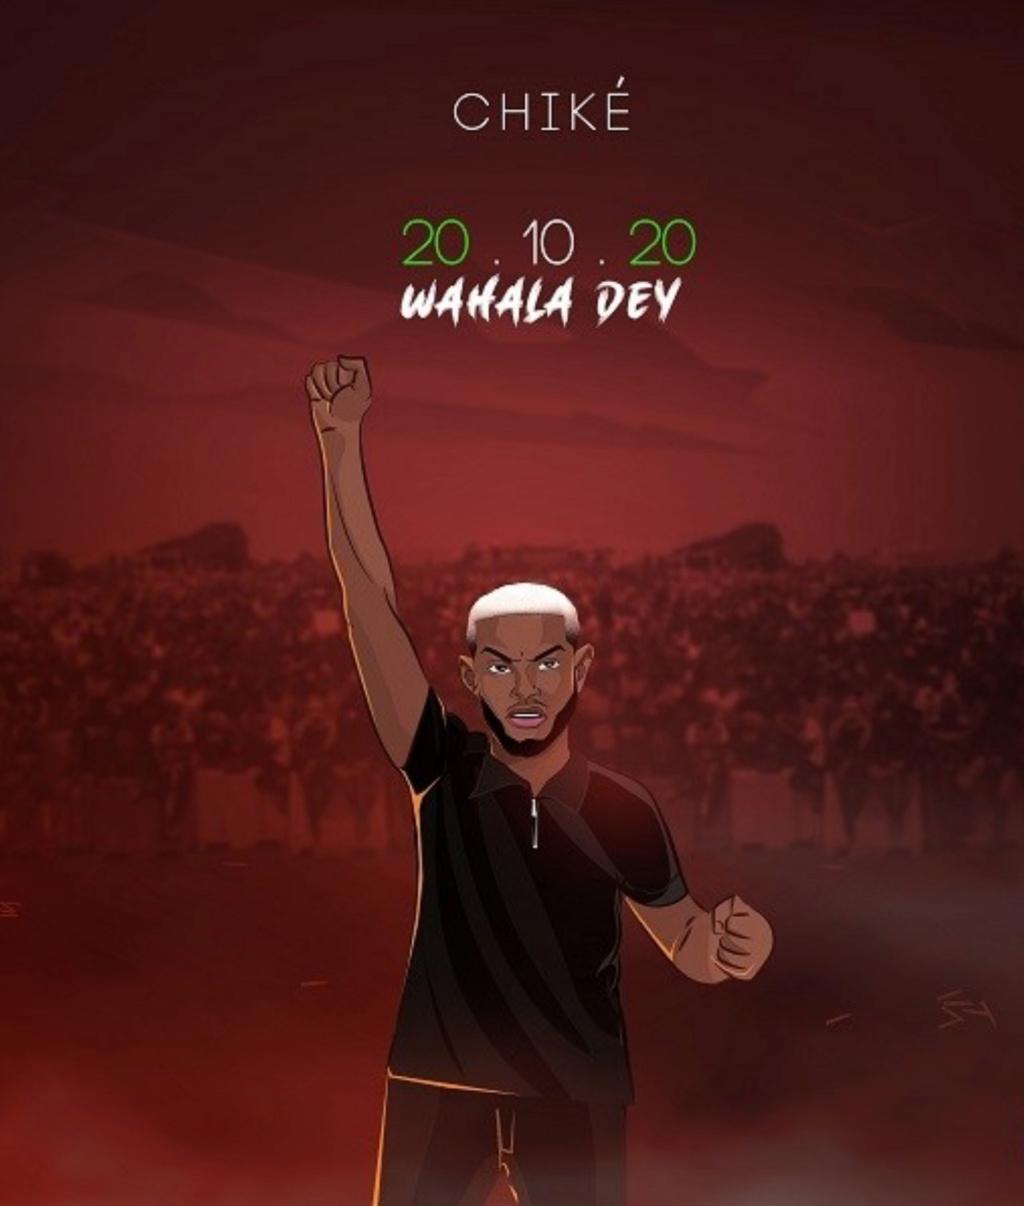 [Music] Chike – 20.10.20 (Wahala Dey) | DOWNLOAD MP3 Insho721